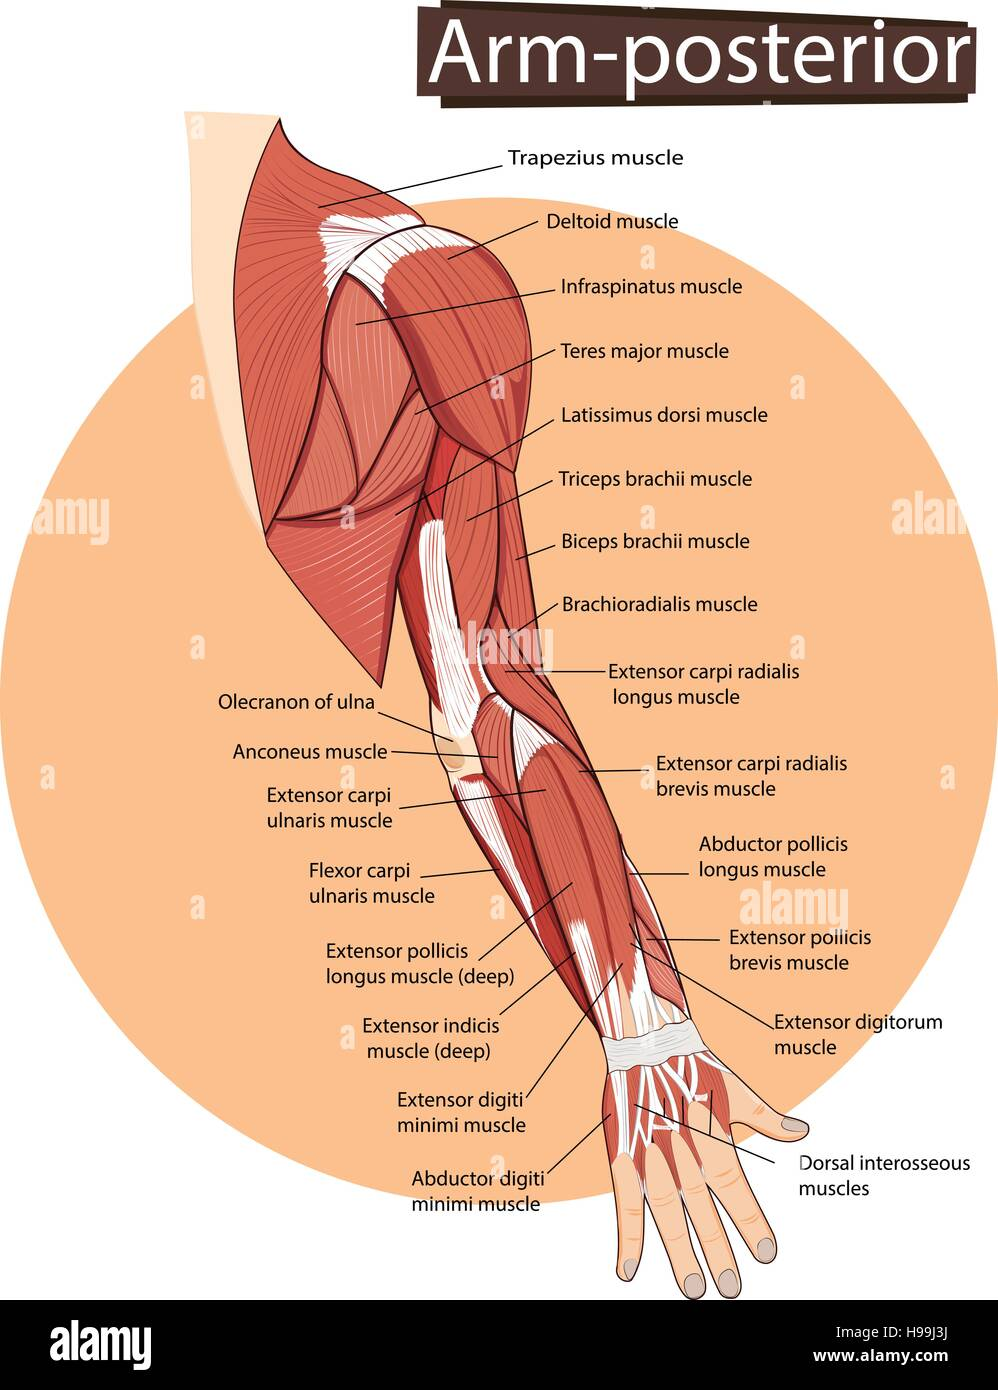 Vektor-Illustration der Arm Anatomie Vektor Abbildung - Bild ...